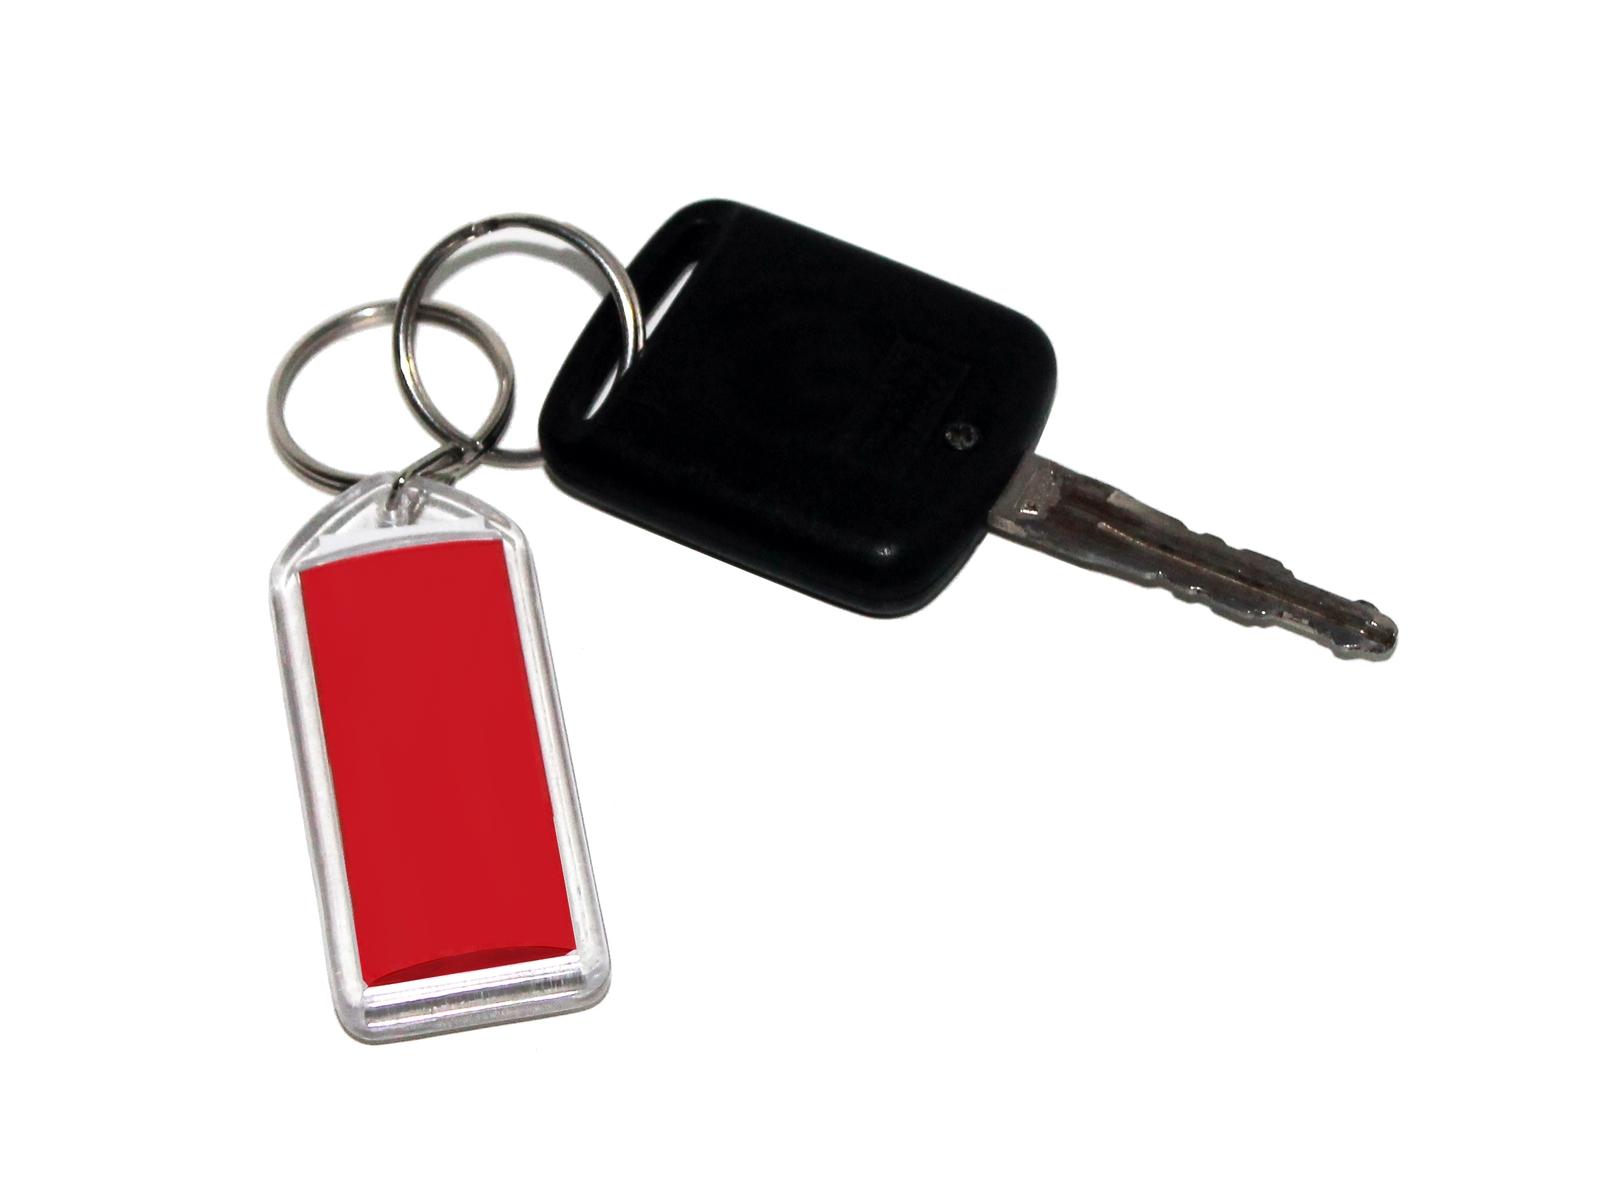 Old style car key